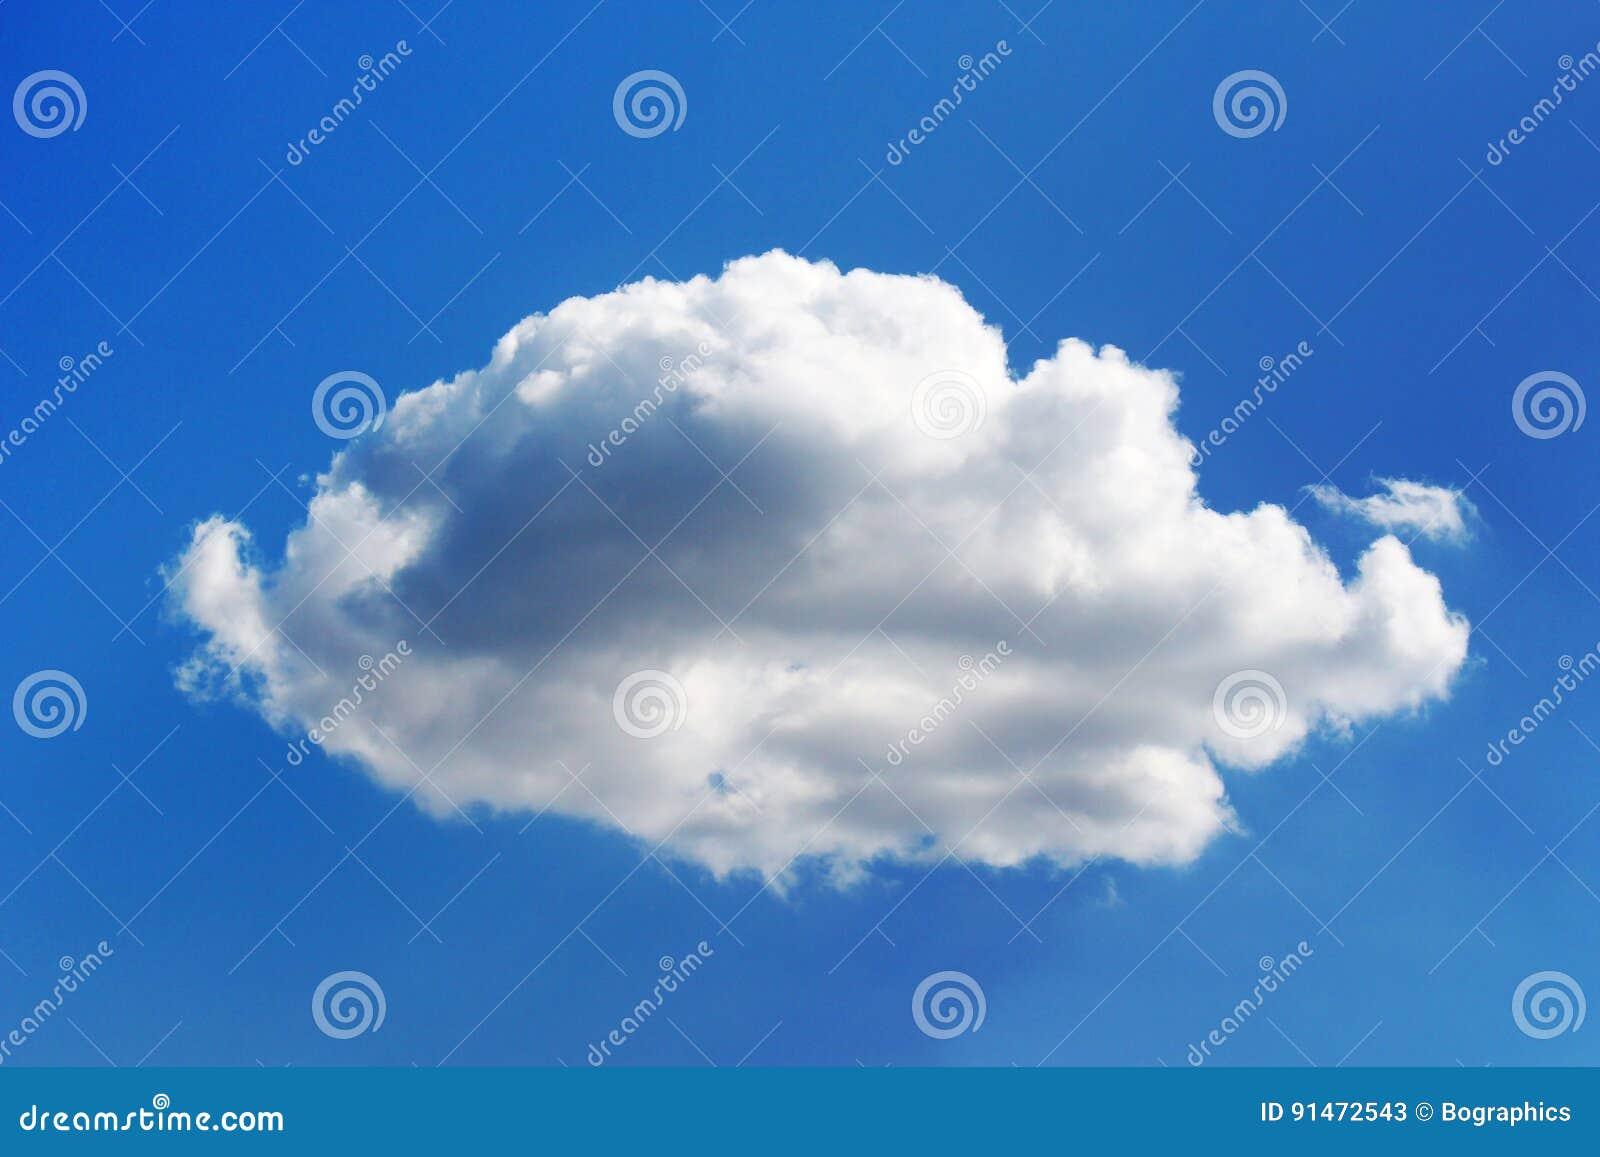 Fluffy chubby white cloud on blue sky